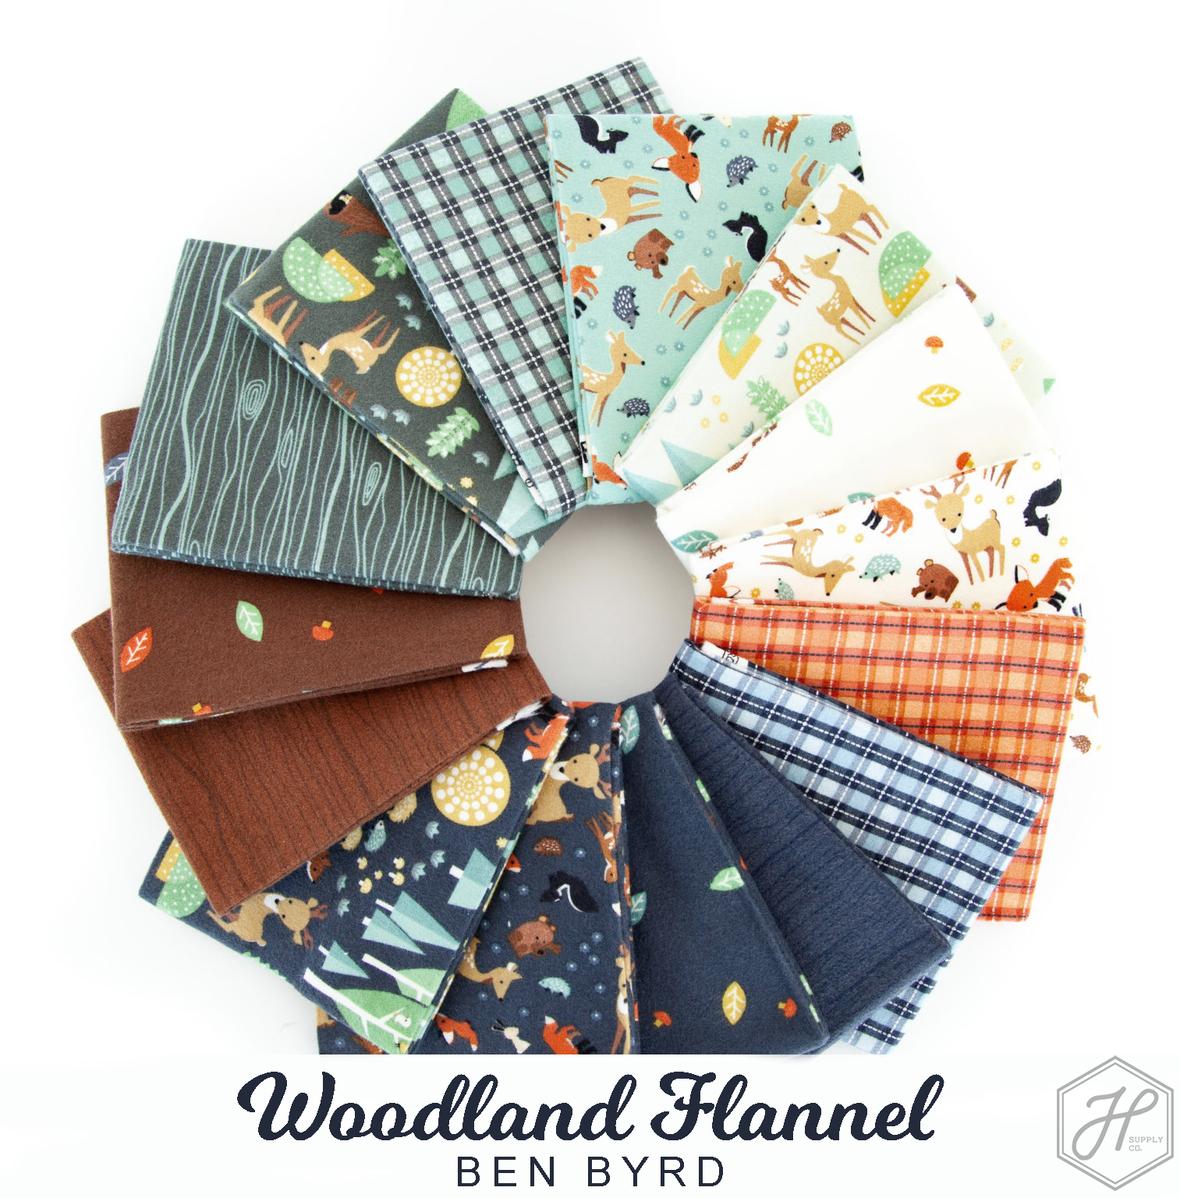 Woodland-Flannel-Ben-Byrd-for-Riley-Blake-at-Hawthorne-Supply-Co